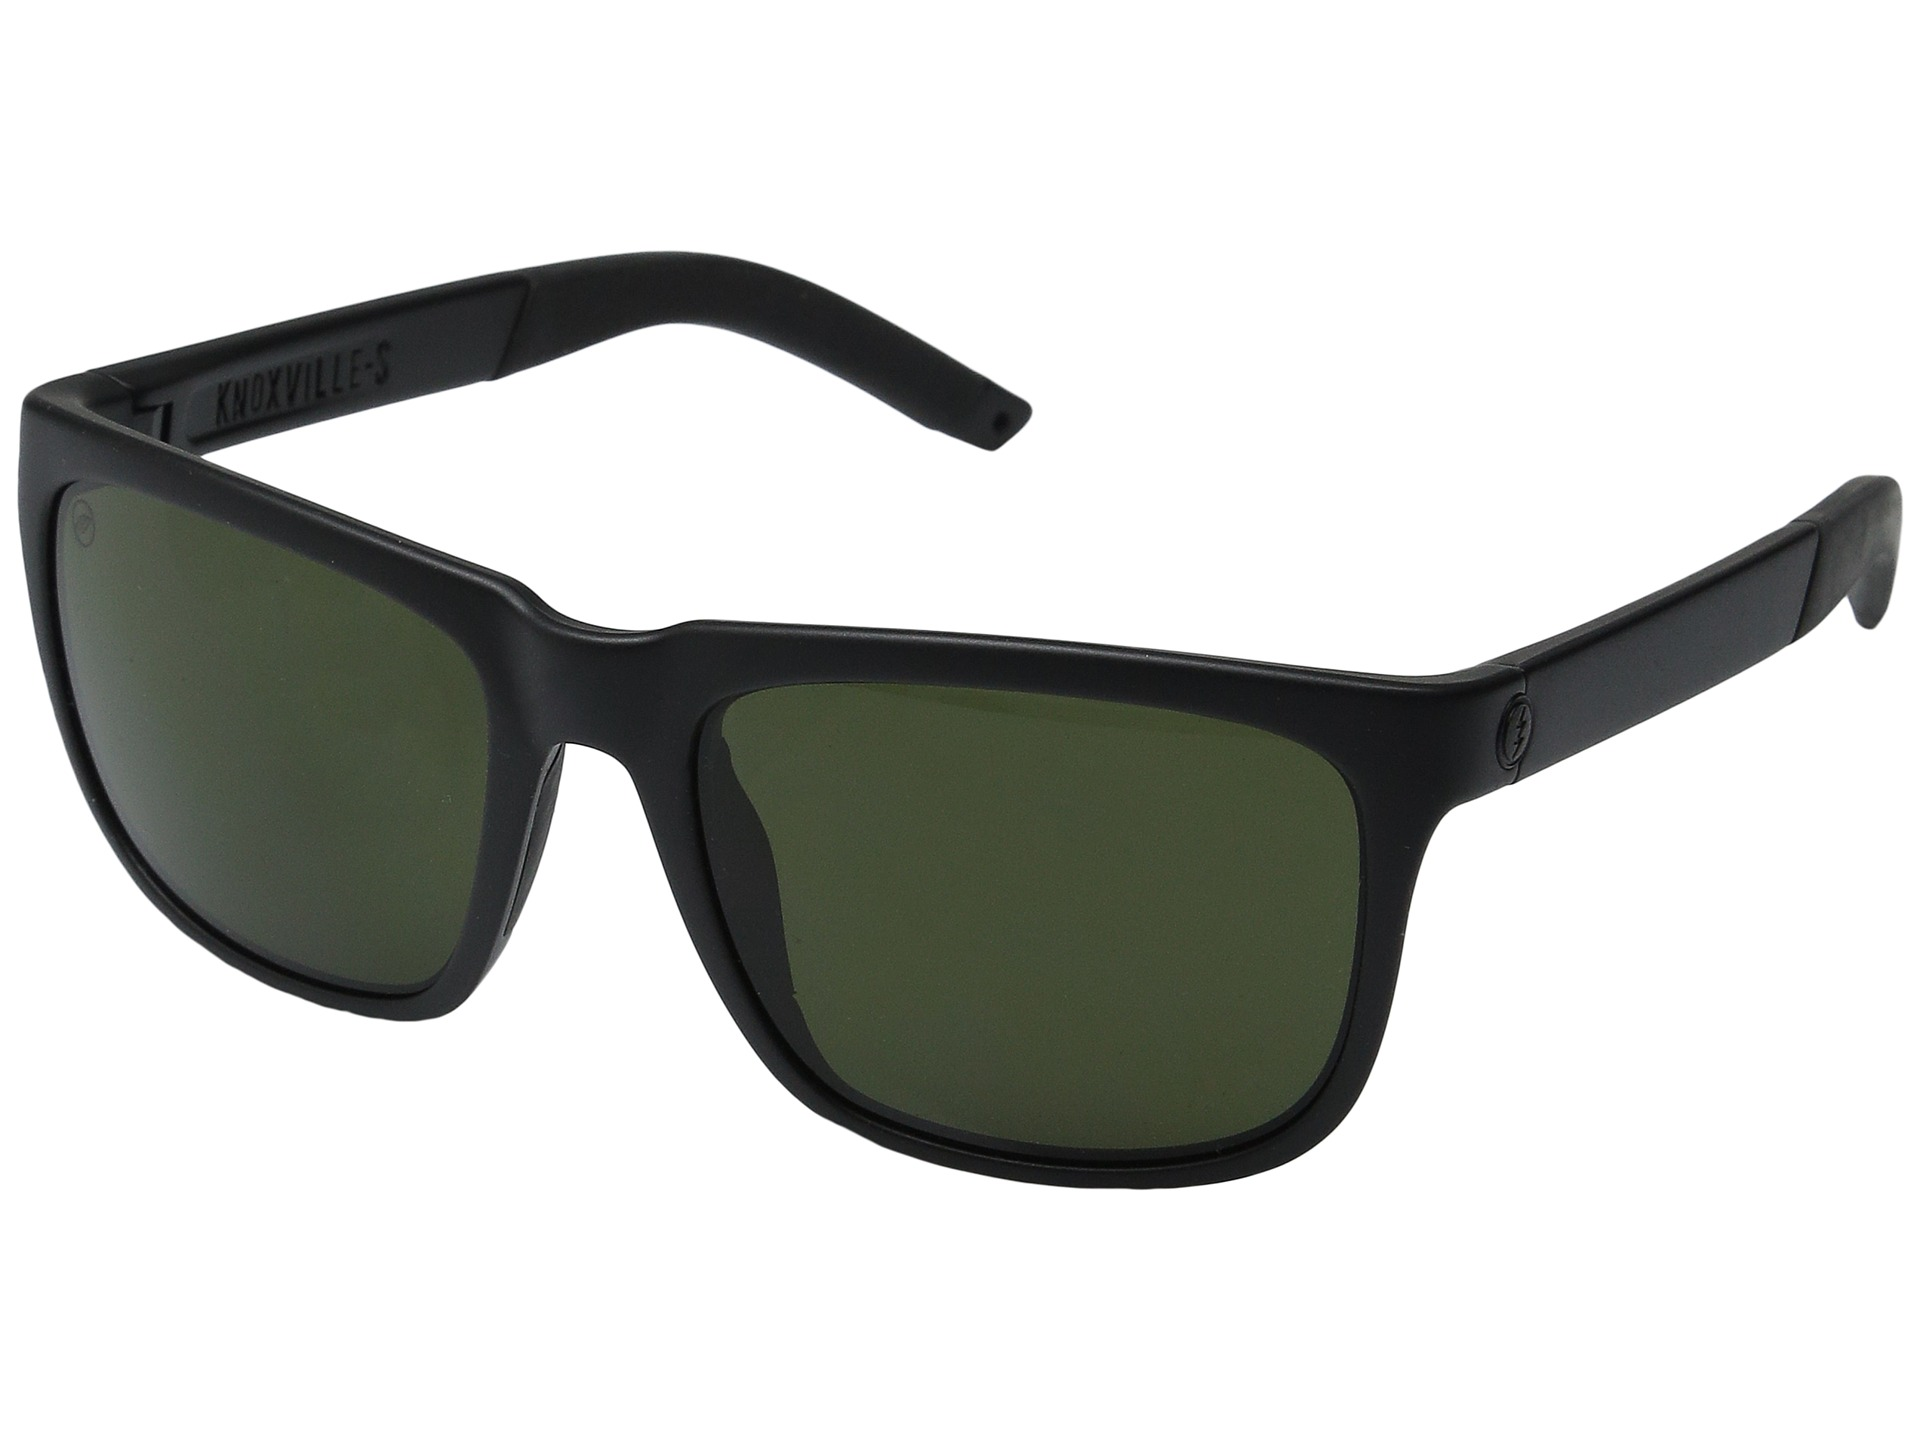 electric eyewear knoxville s at zappos